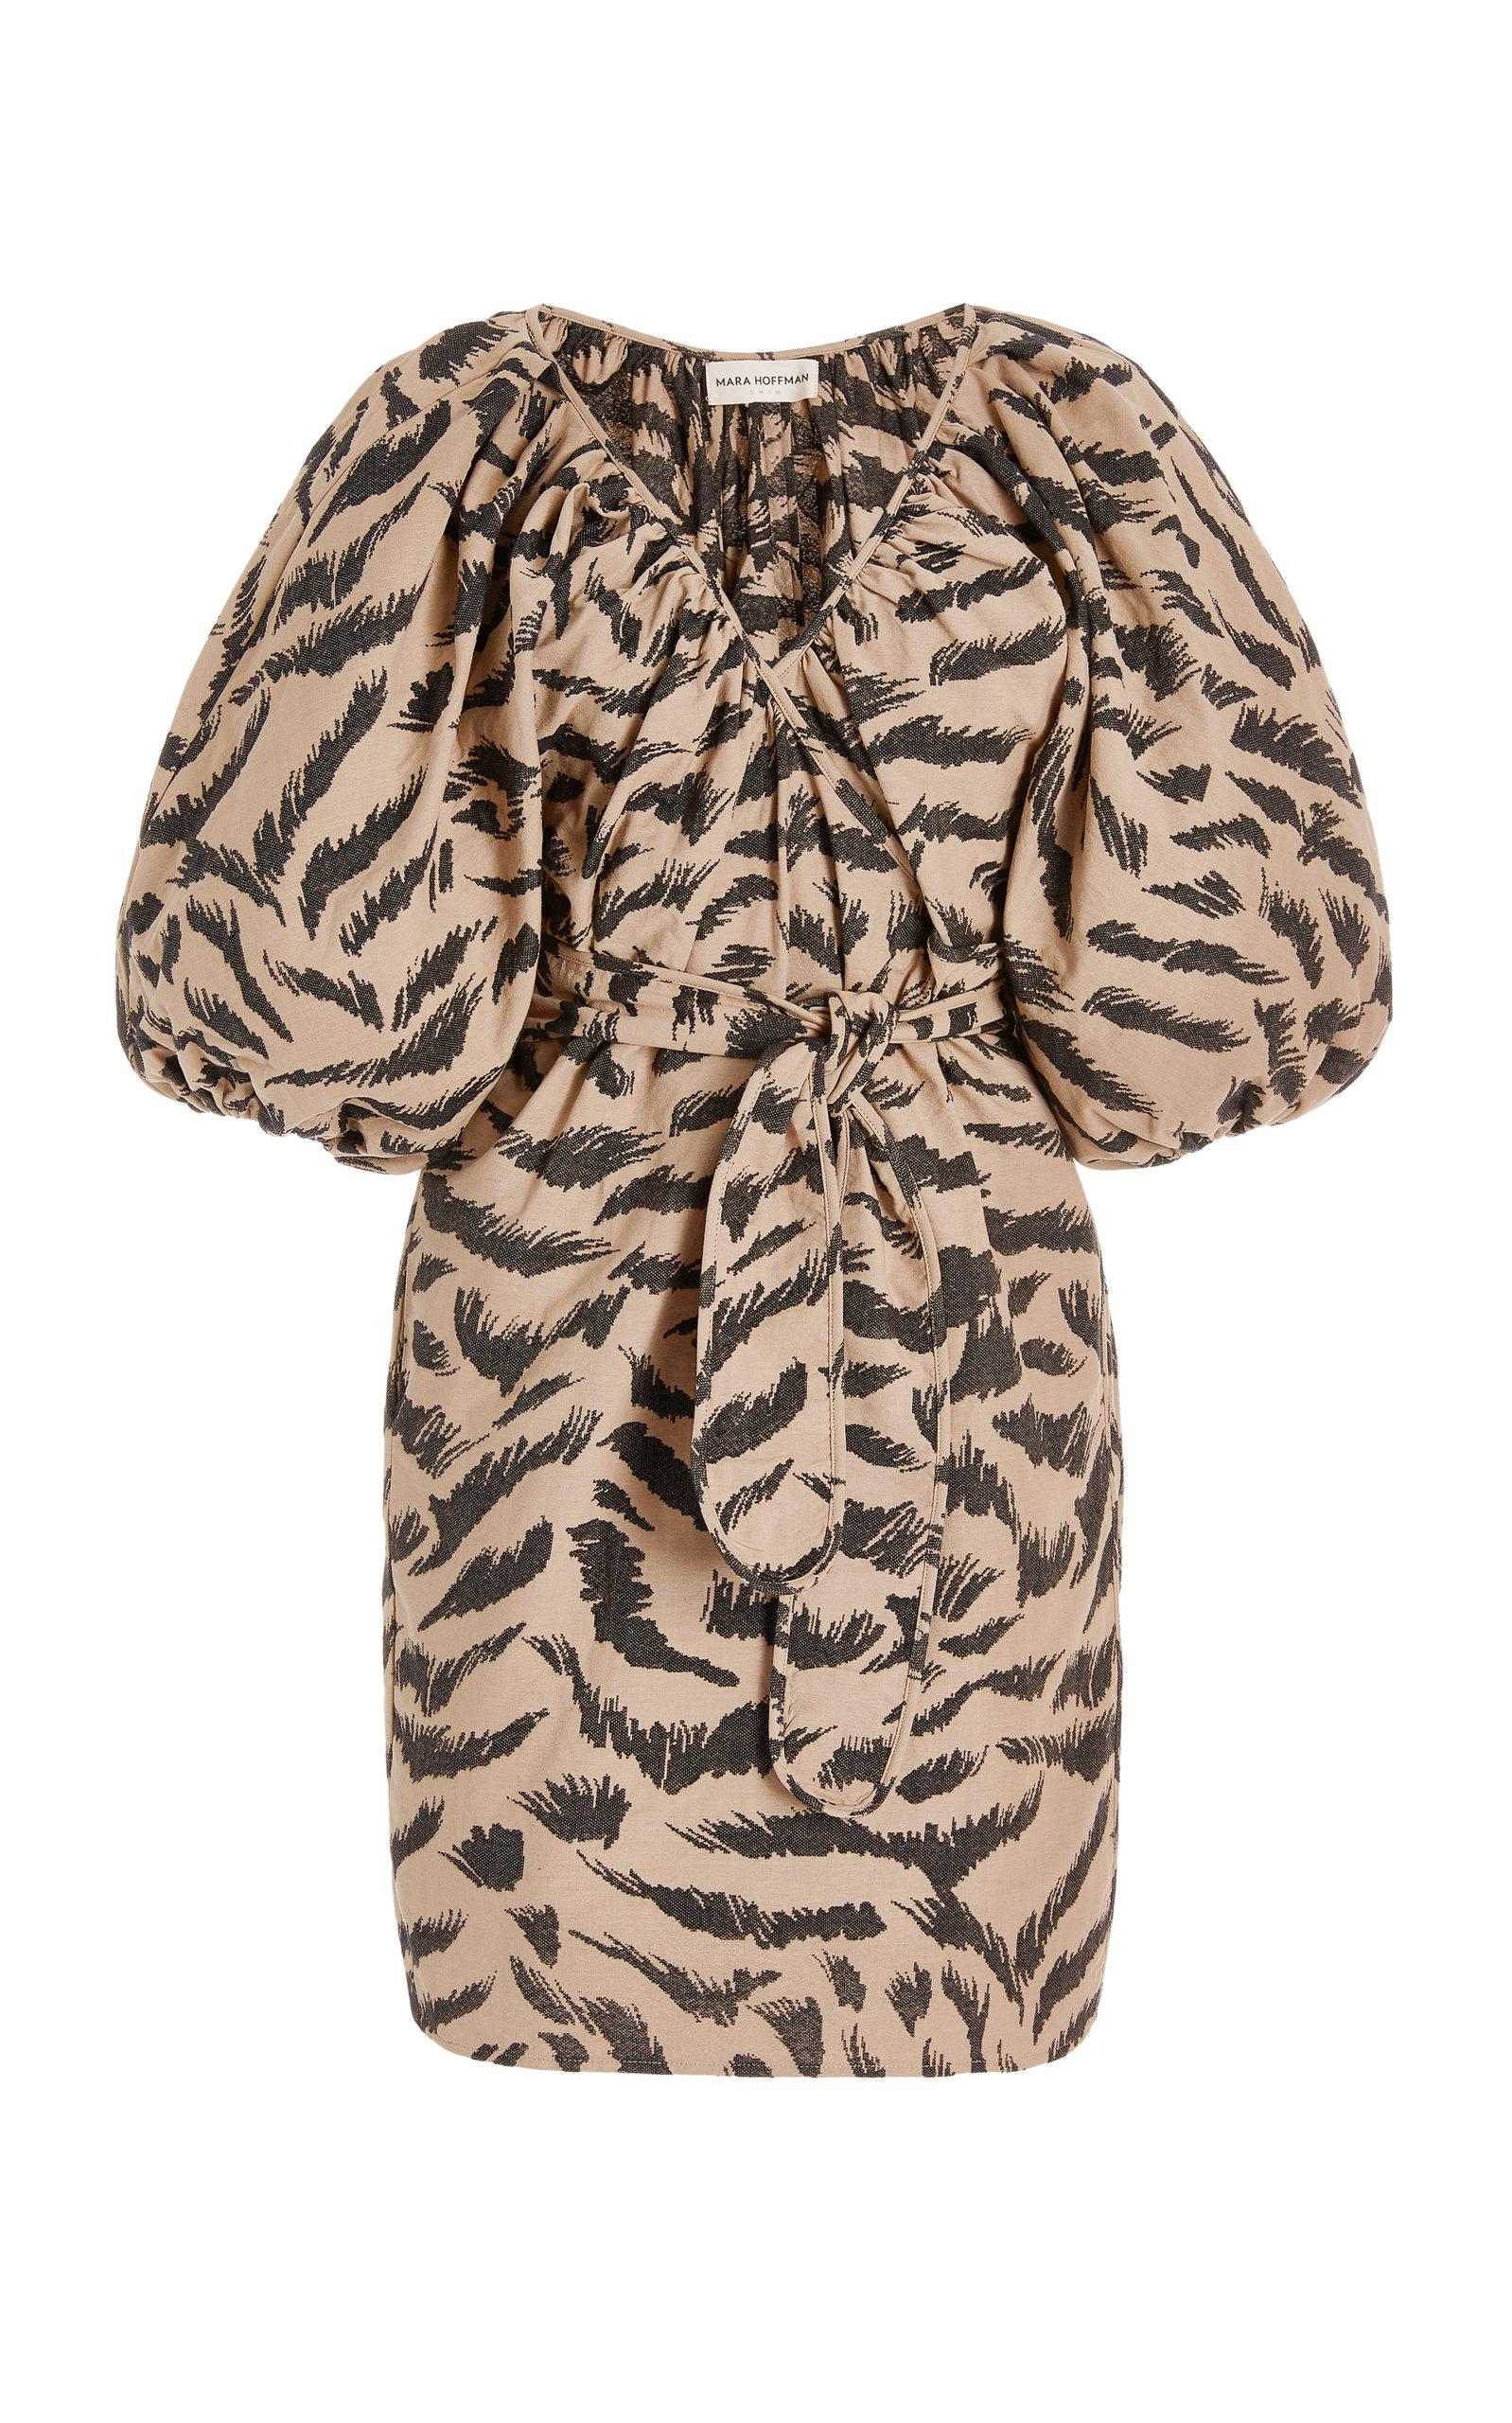 Mara Hoffman Cottons WOMEN'S COLETTA ORGANIC COTTON JACQUARD MINI WRAP DRESS